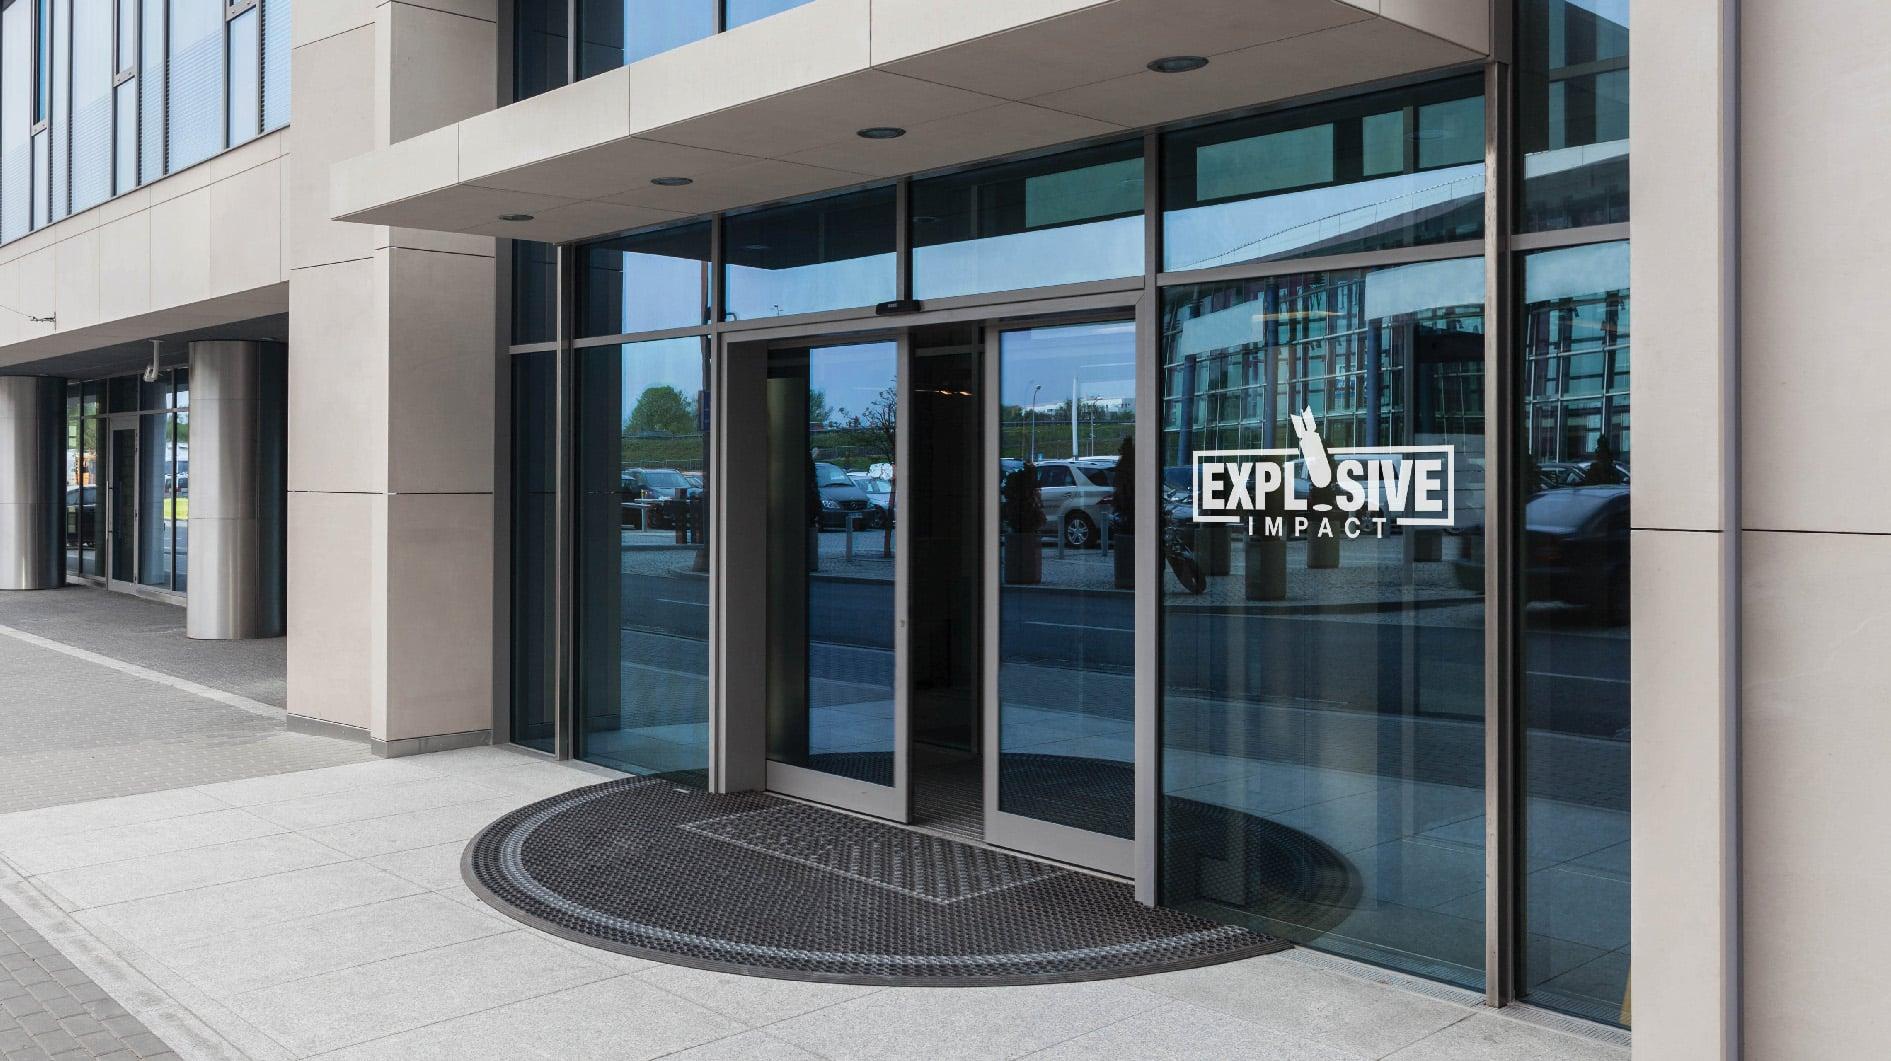 Explosive Impact Building